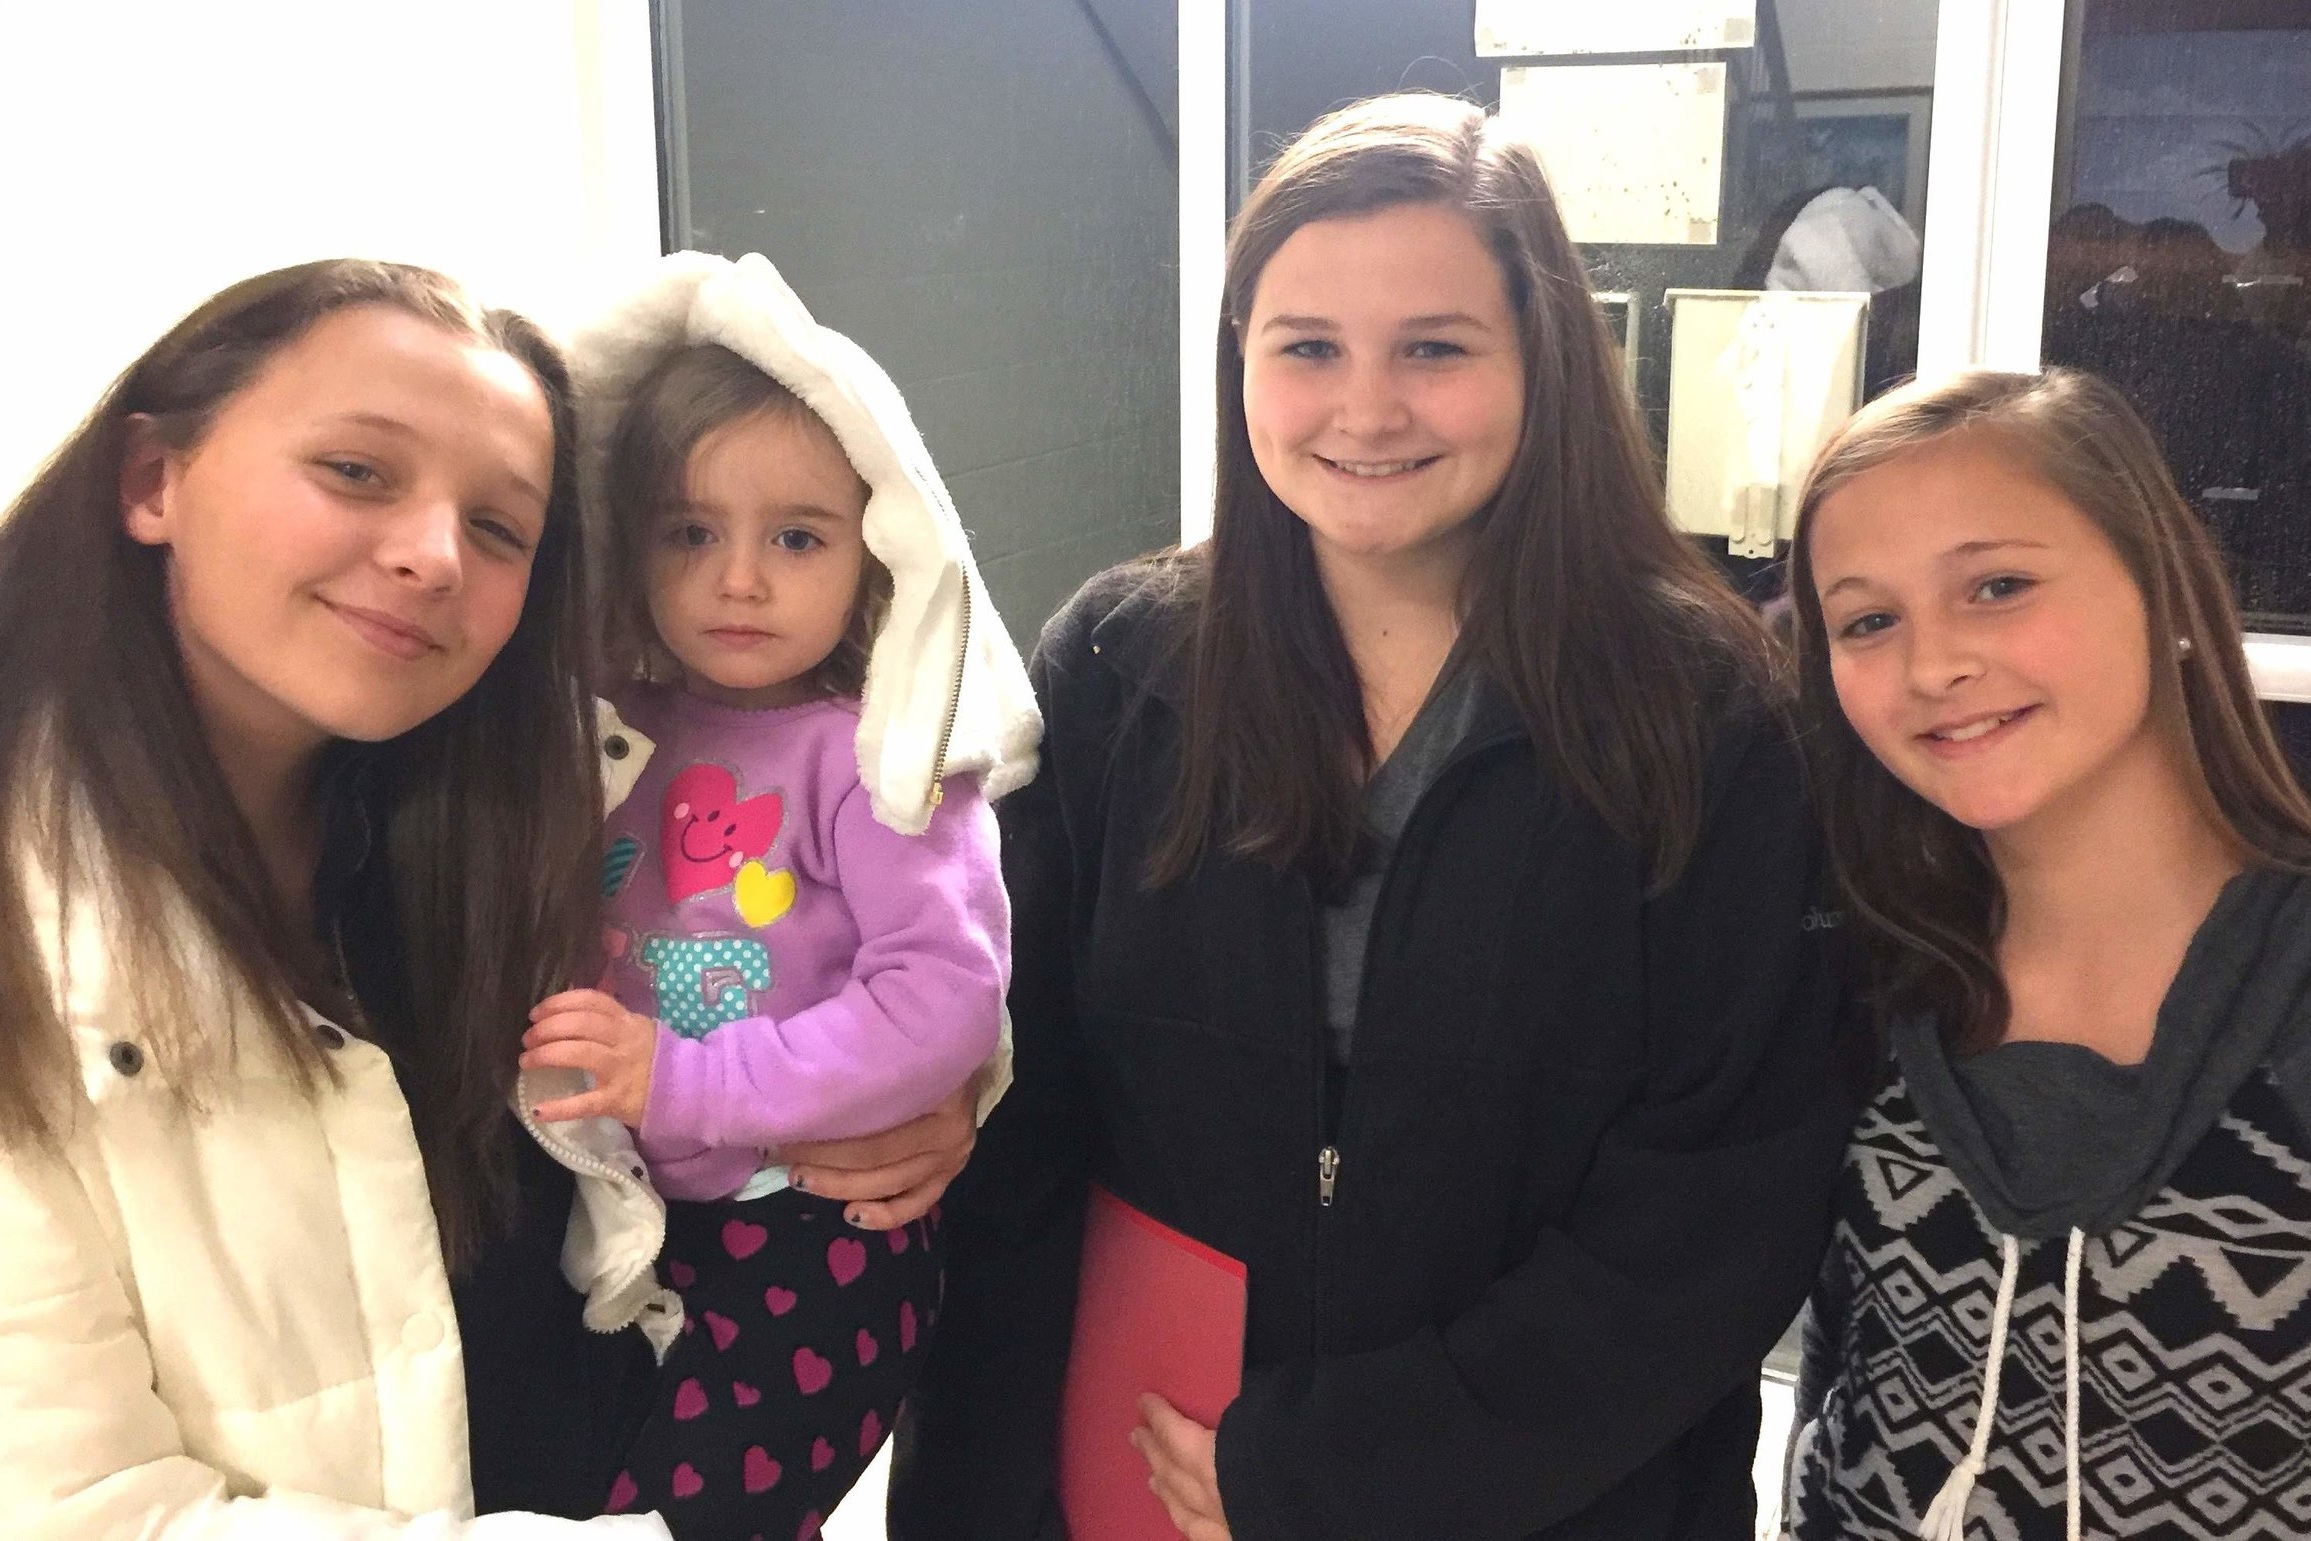 Tonya's Story - Tonya's daughters: Chloe, Bekah, Molly & Ruby